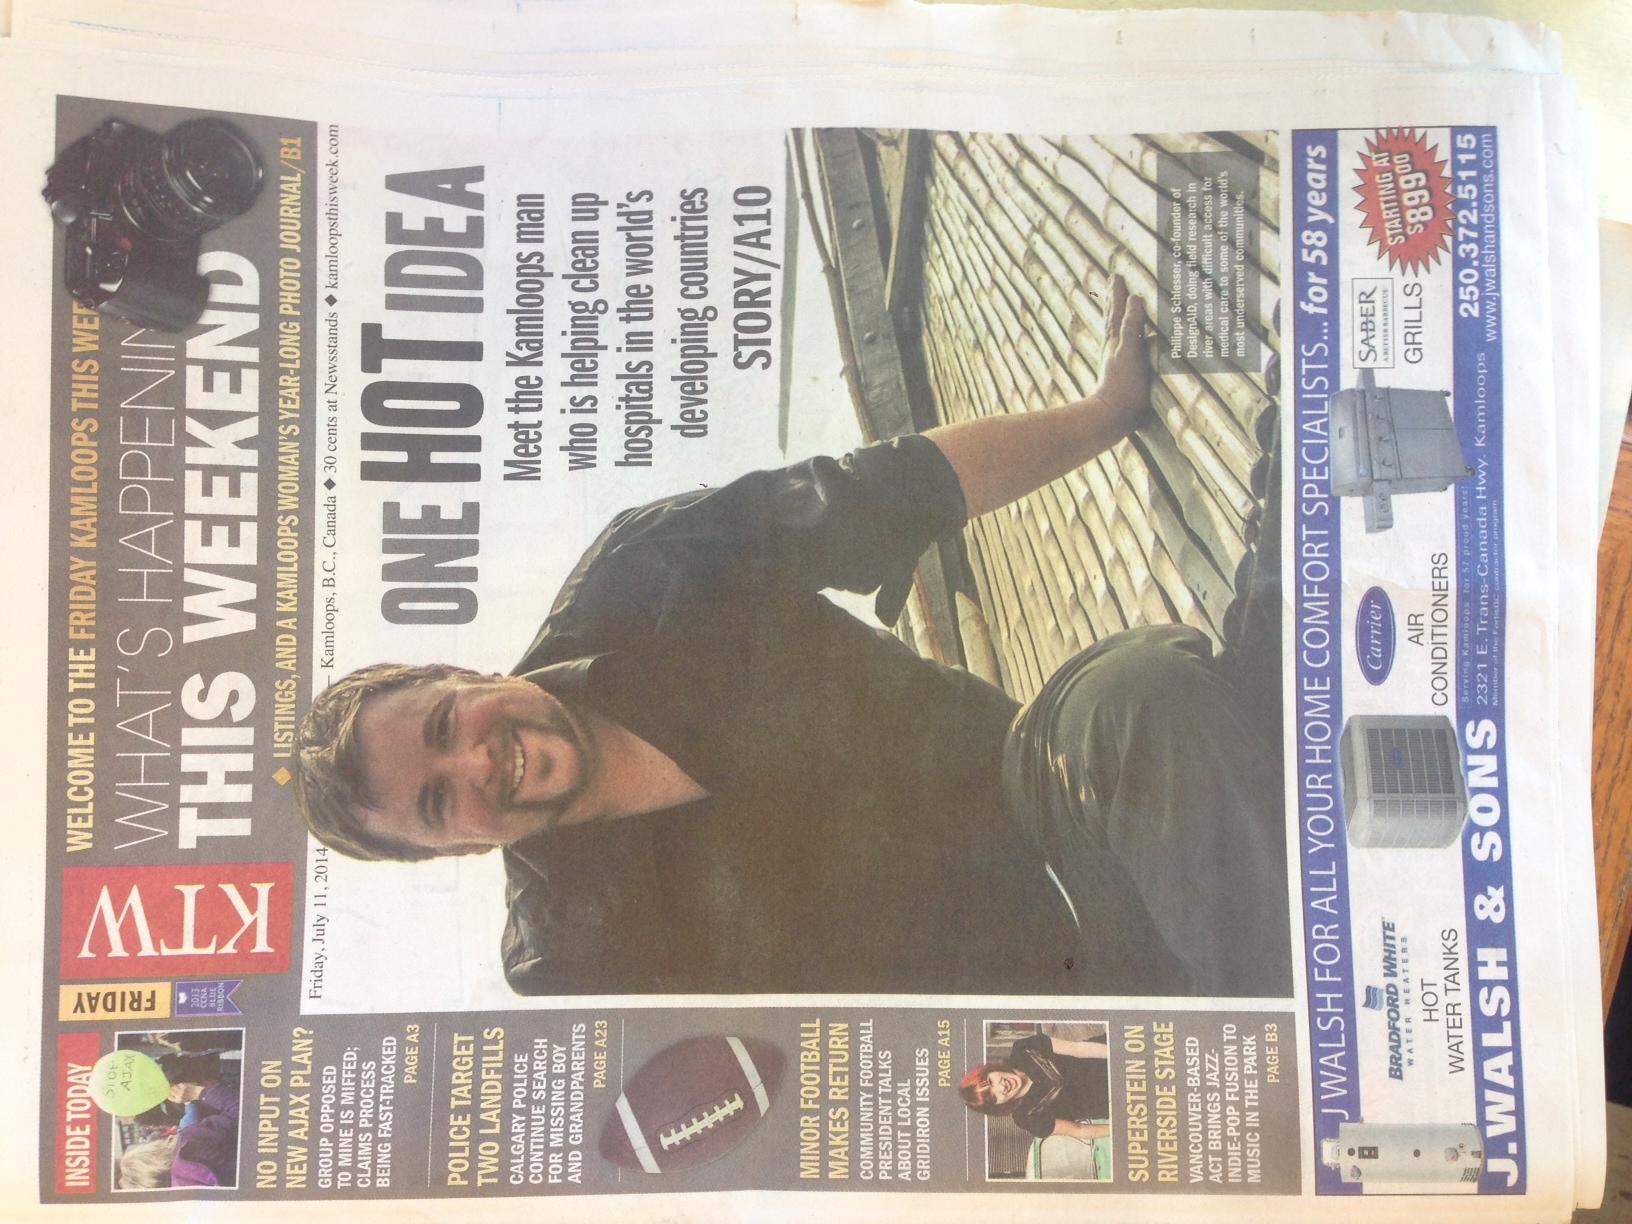 Kamloops this week covered our Incinerator Initiative story.